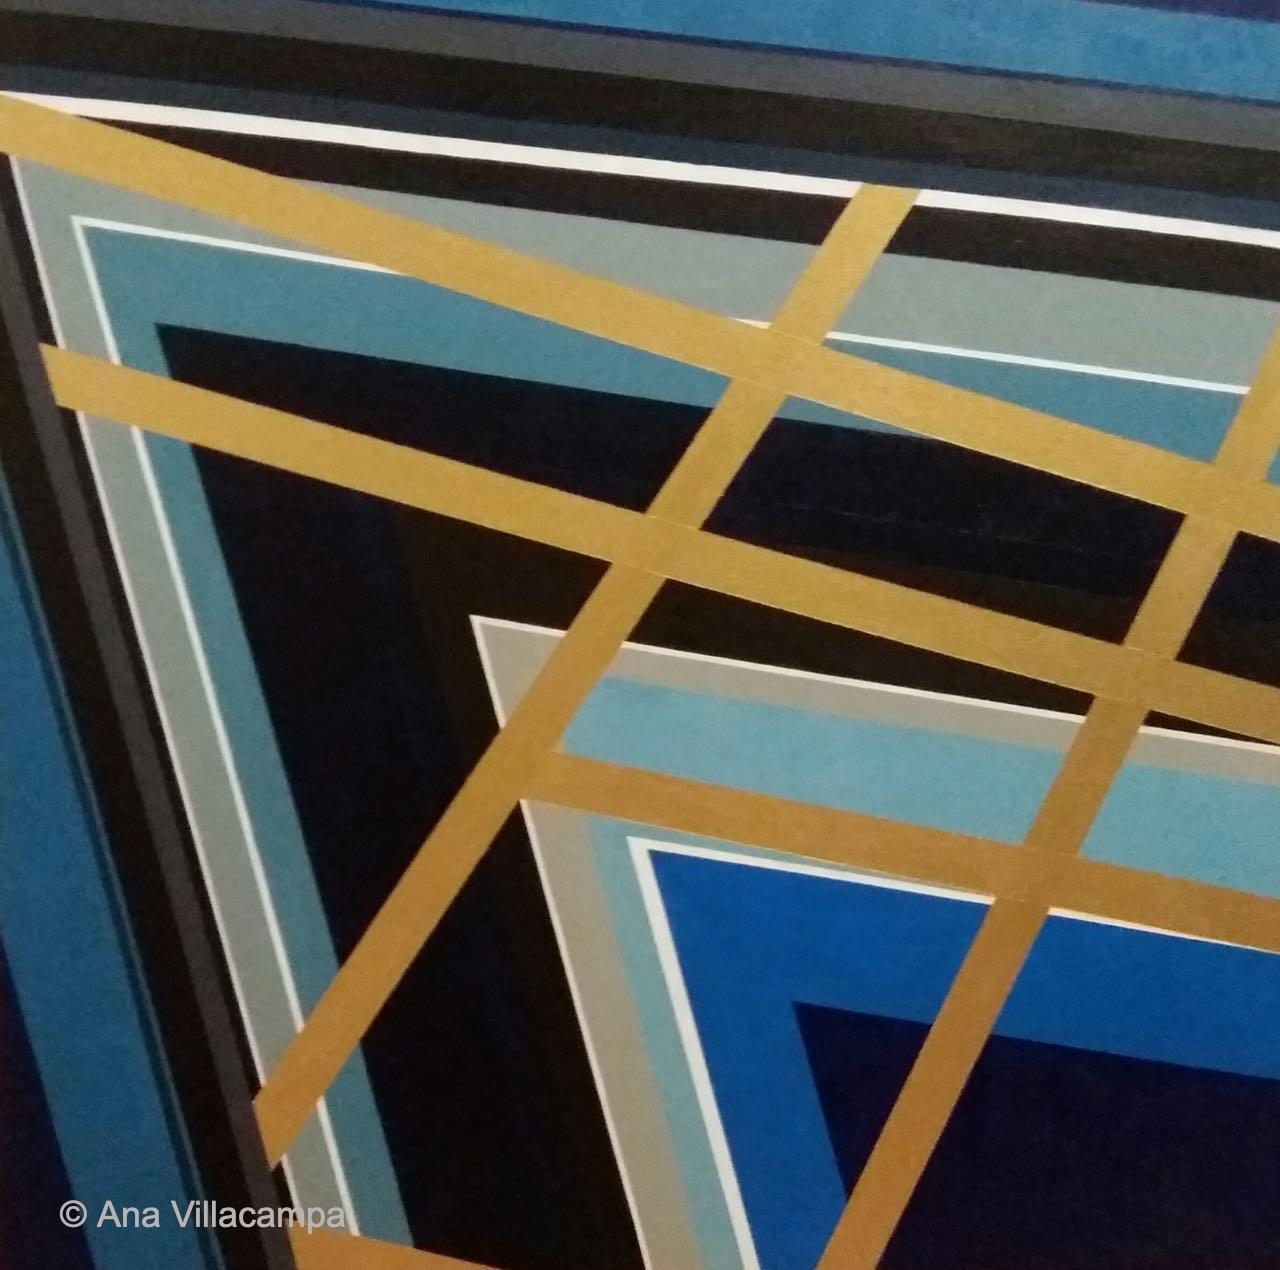 """Sailing reflections"" by A. Villacampa"